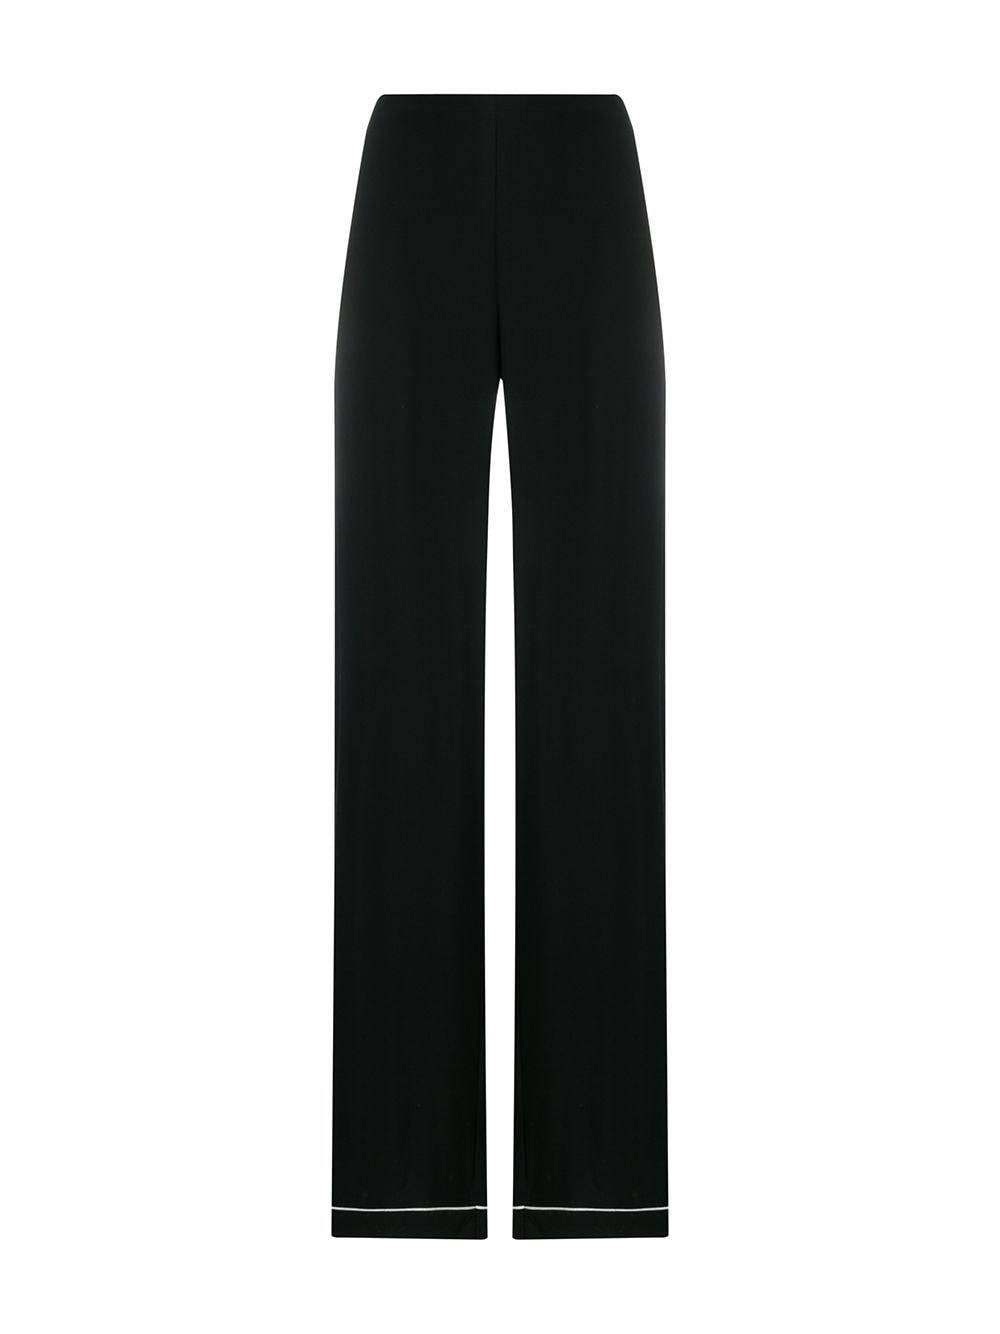 Set de pijama Adelaide La Perla de Tejido sintético de color Negro